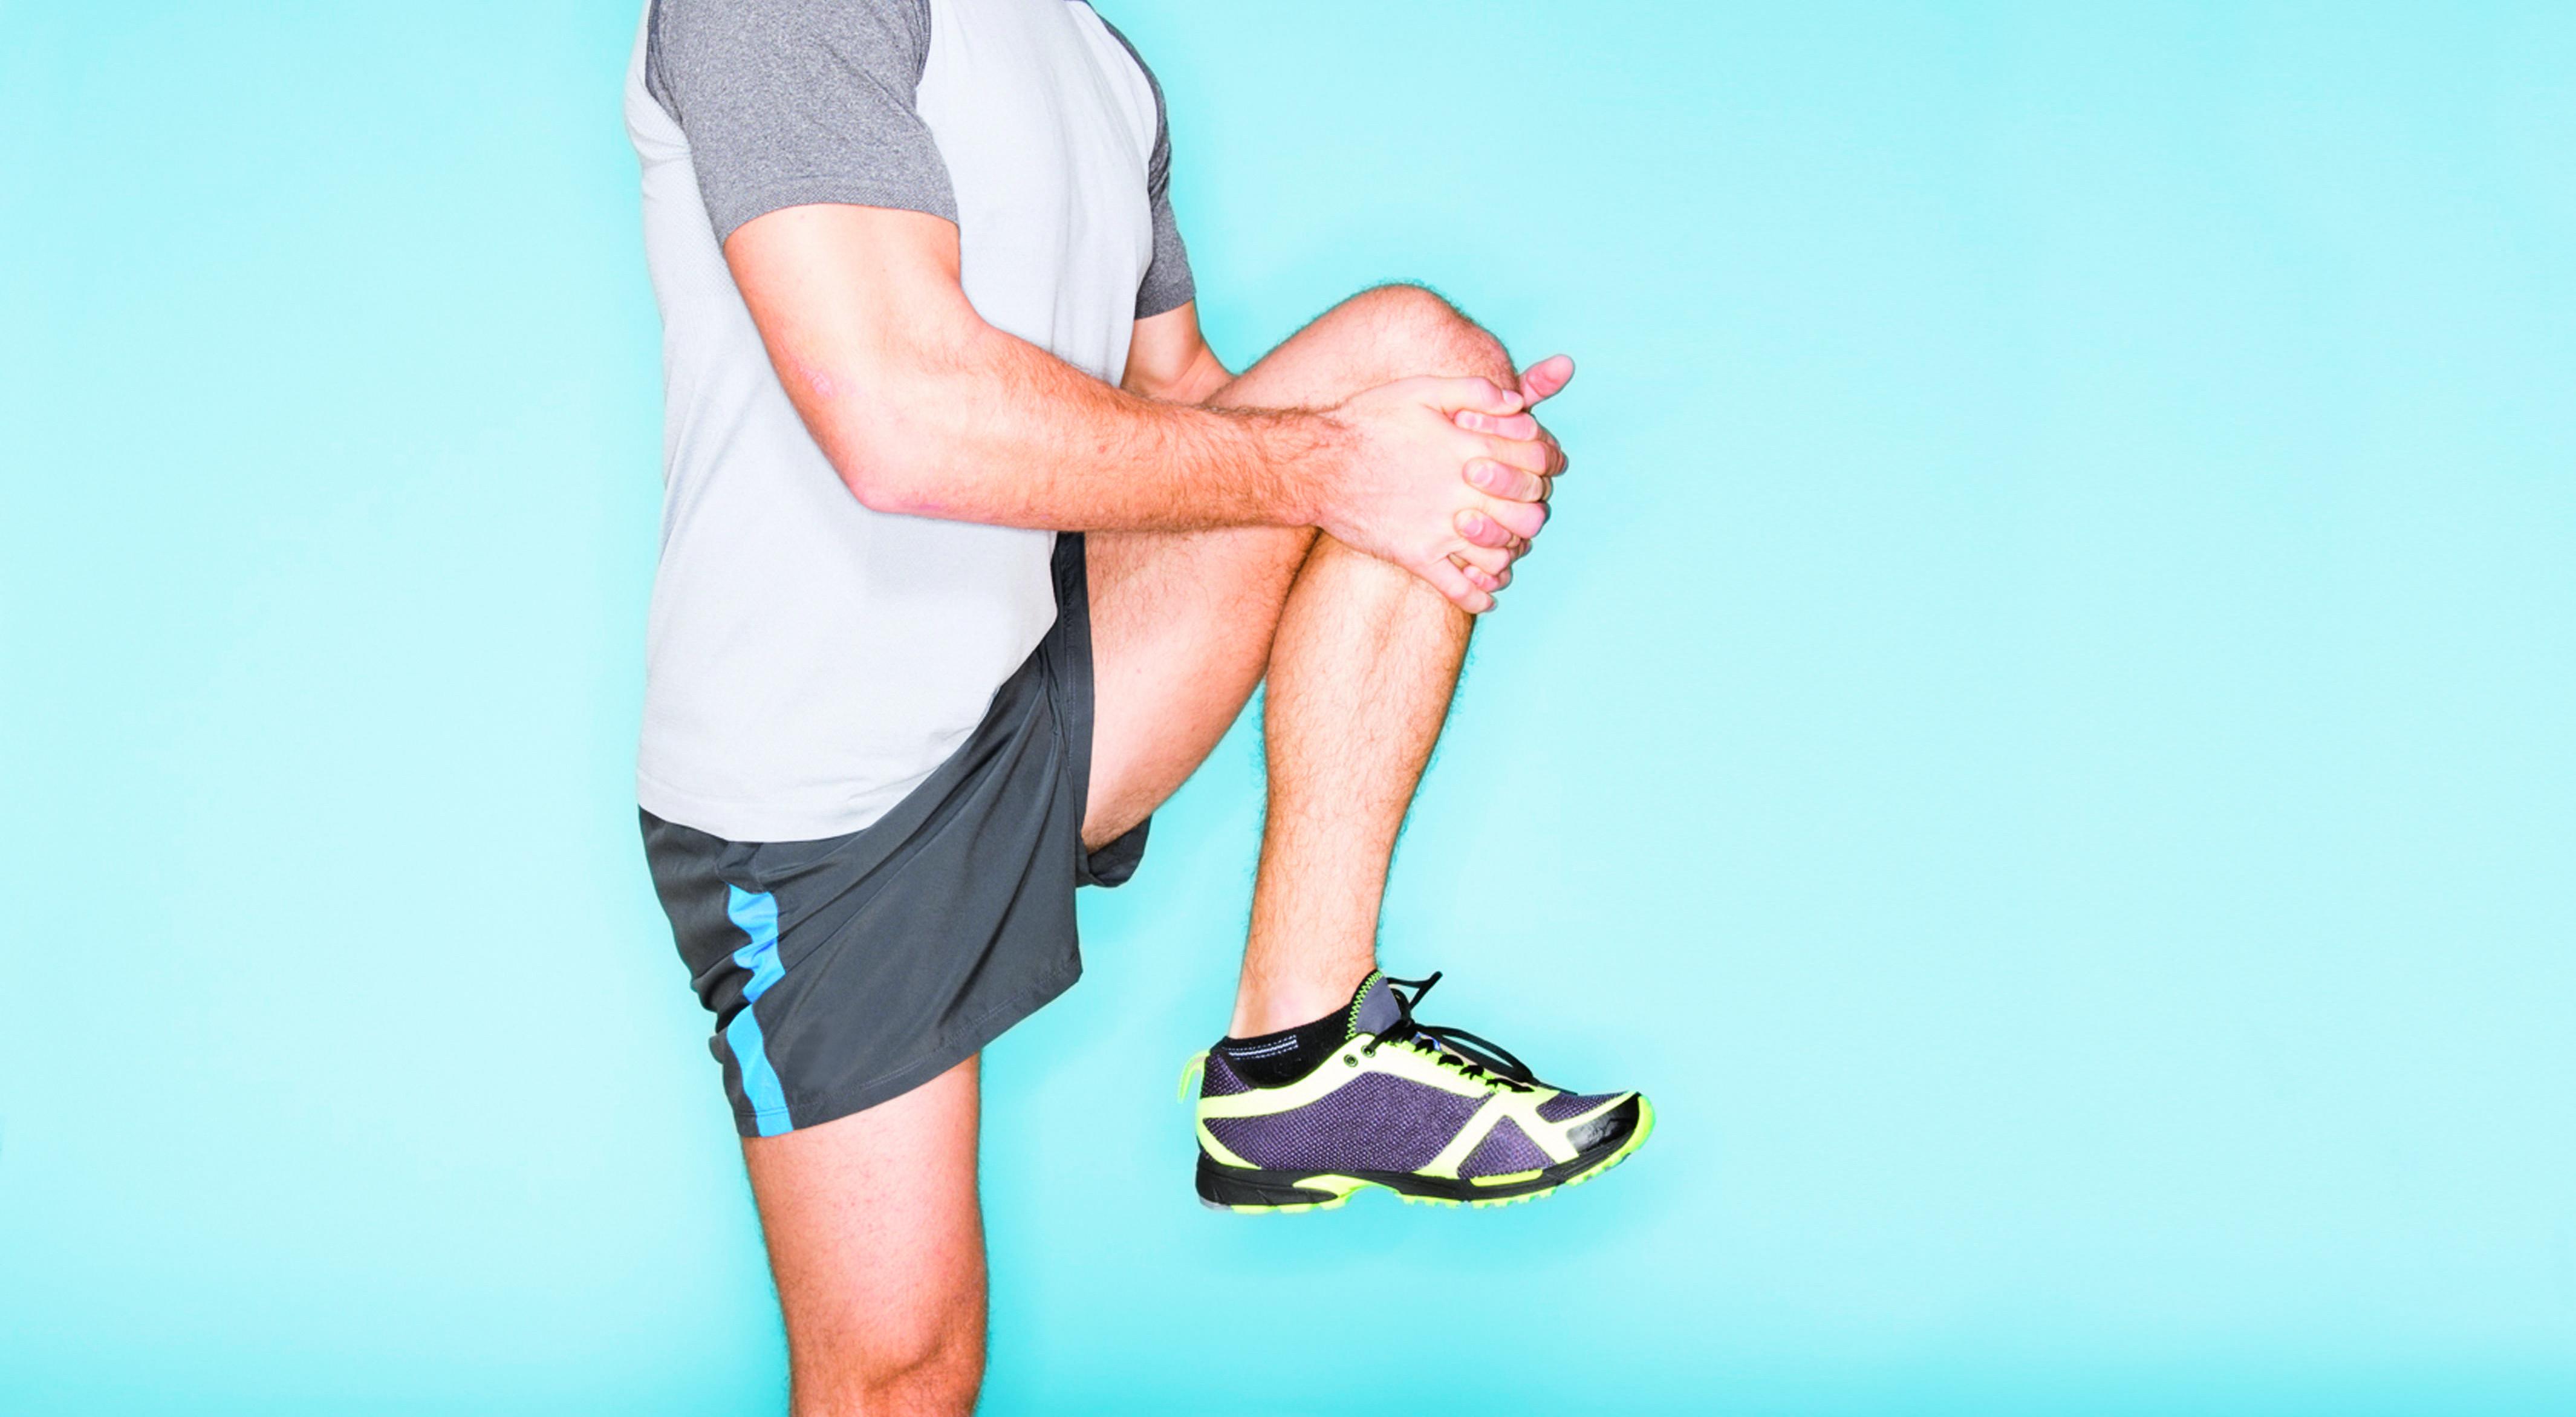 6 exercices pour renforcer vos genoux